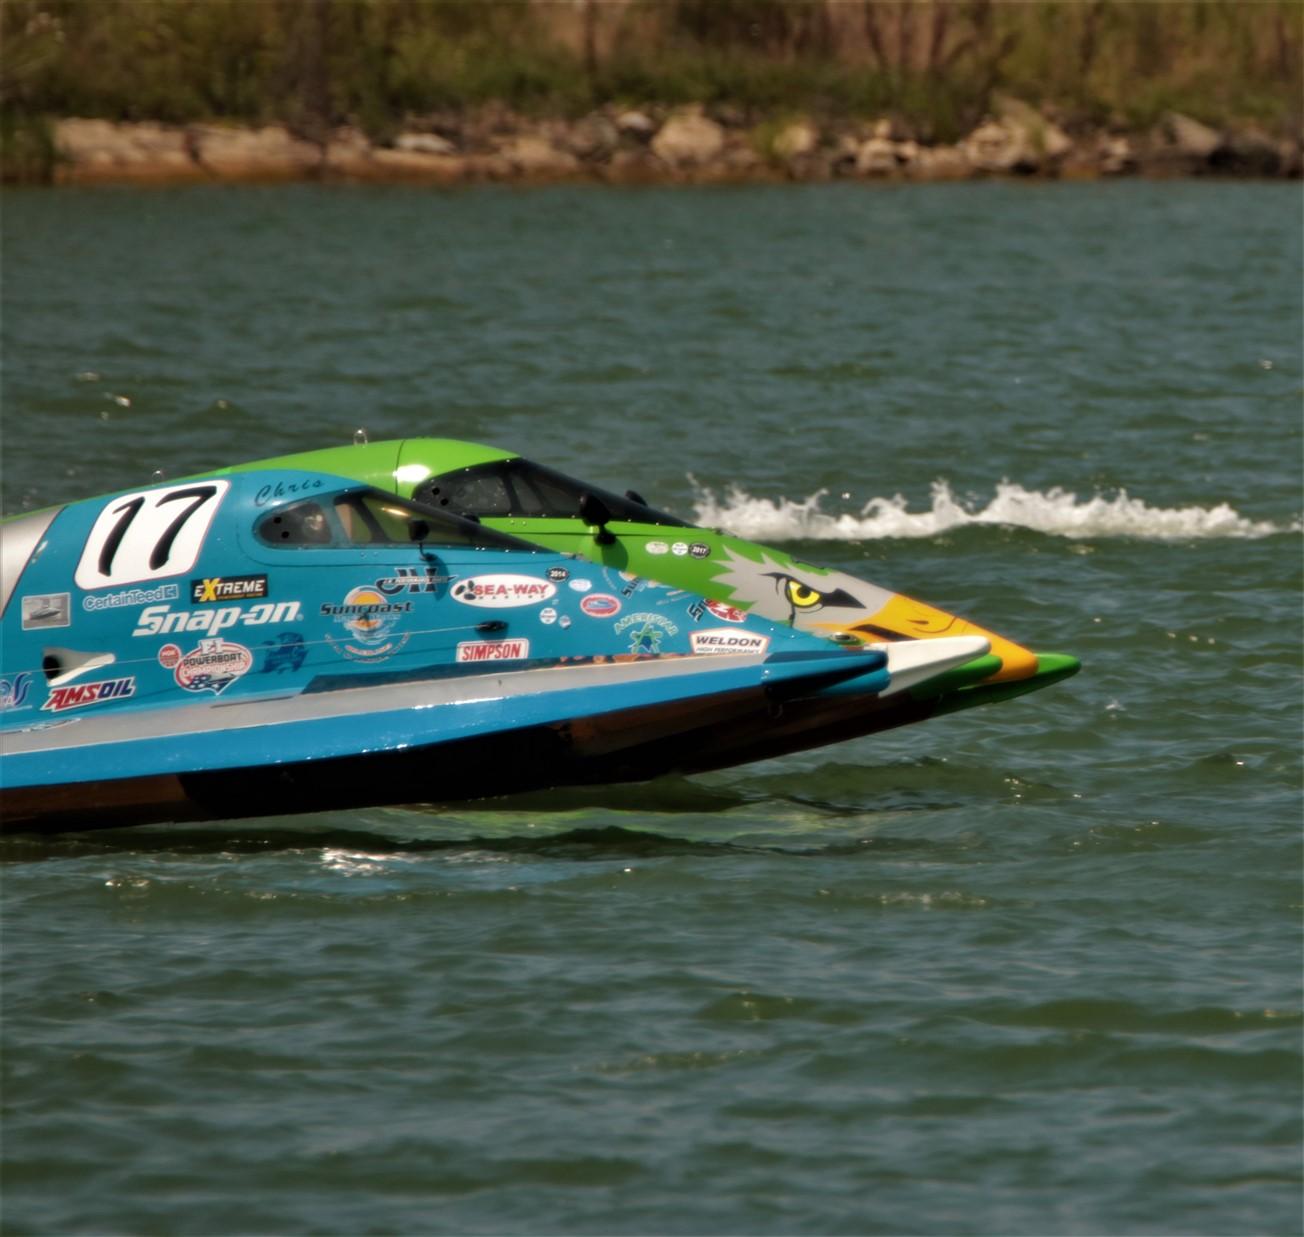 2017 08 26 141 Springfield OH Boat Races.jpg